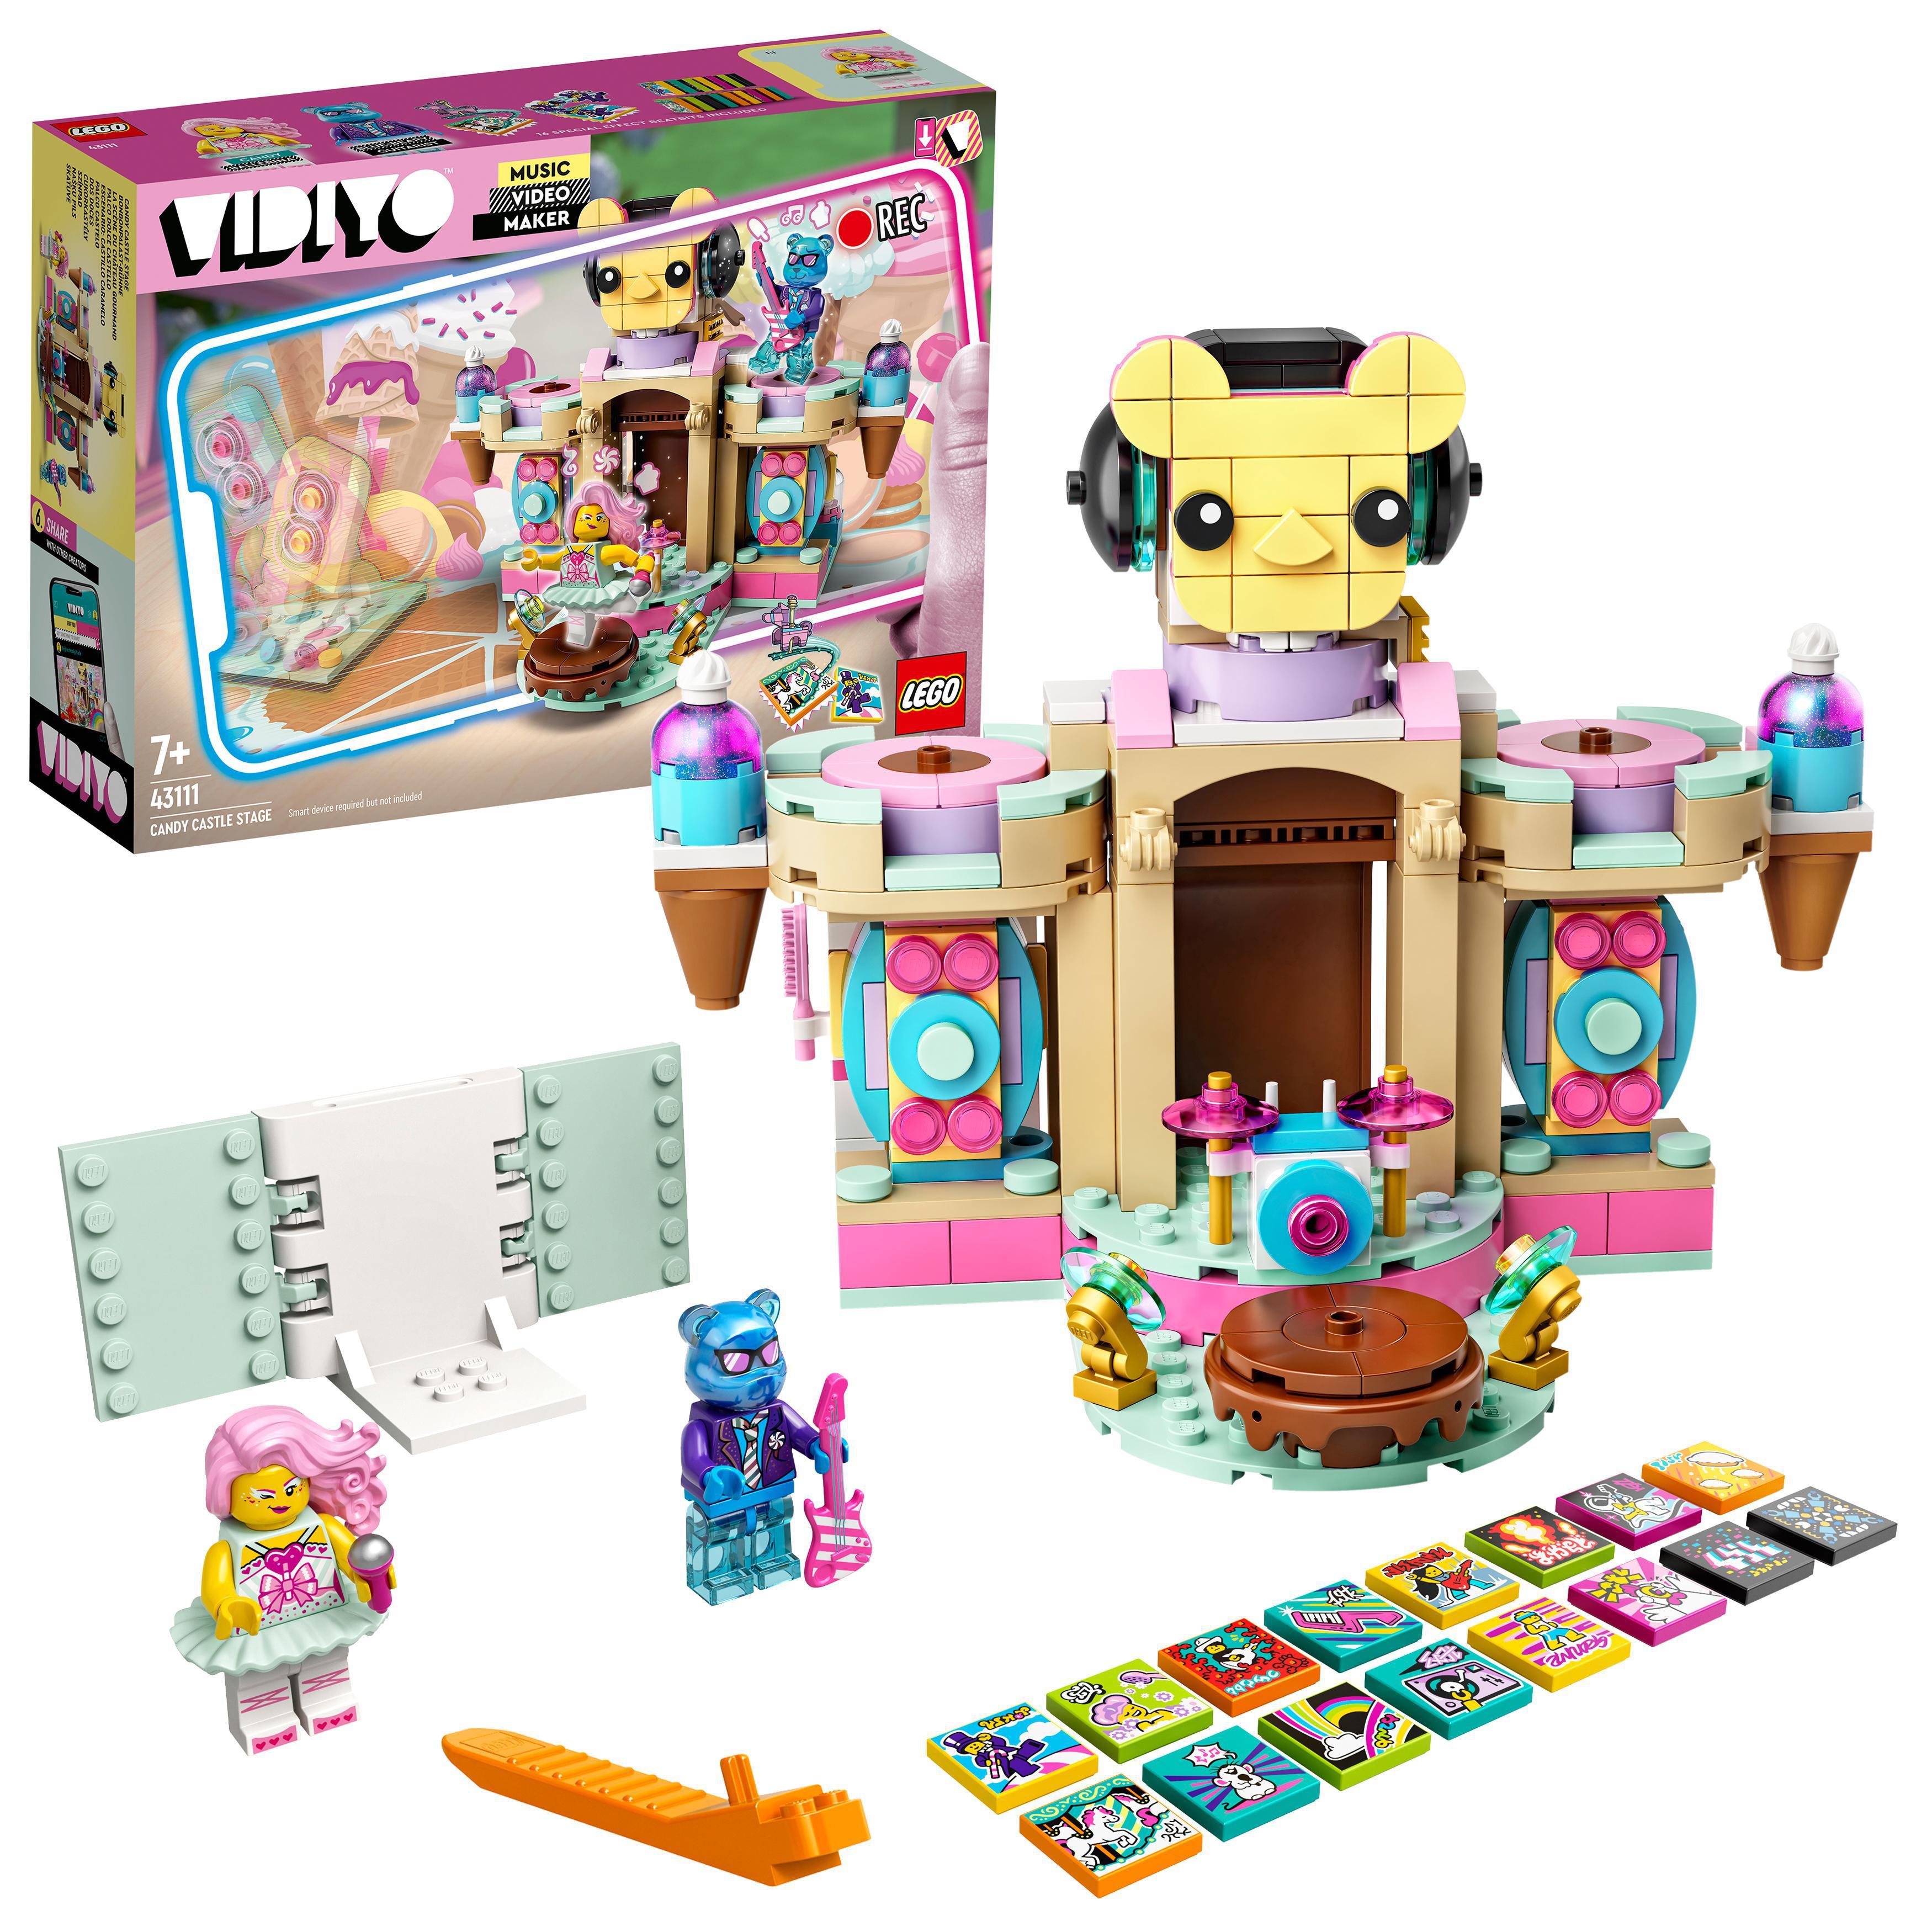 LEGO VIDIYO - Candy Castle Stage (43111)